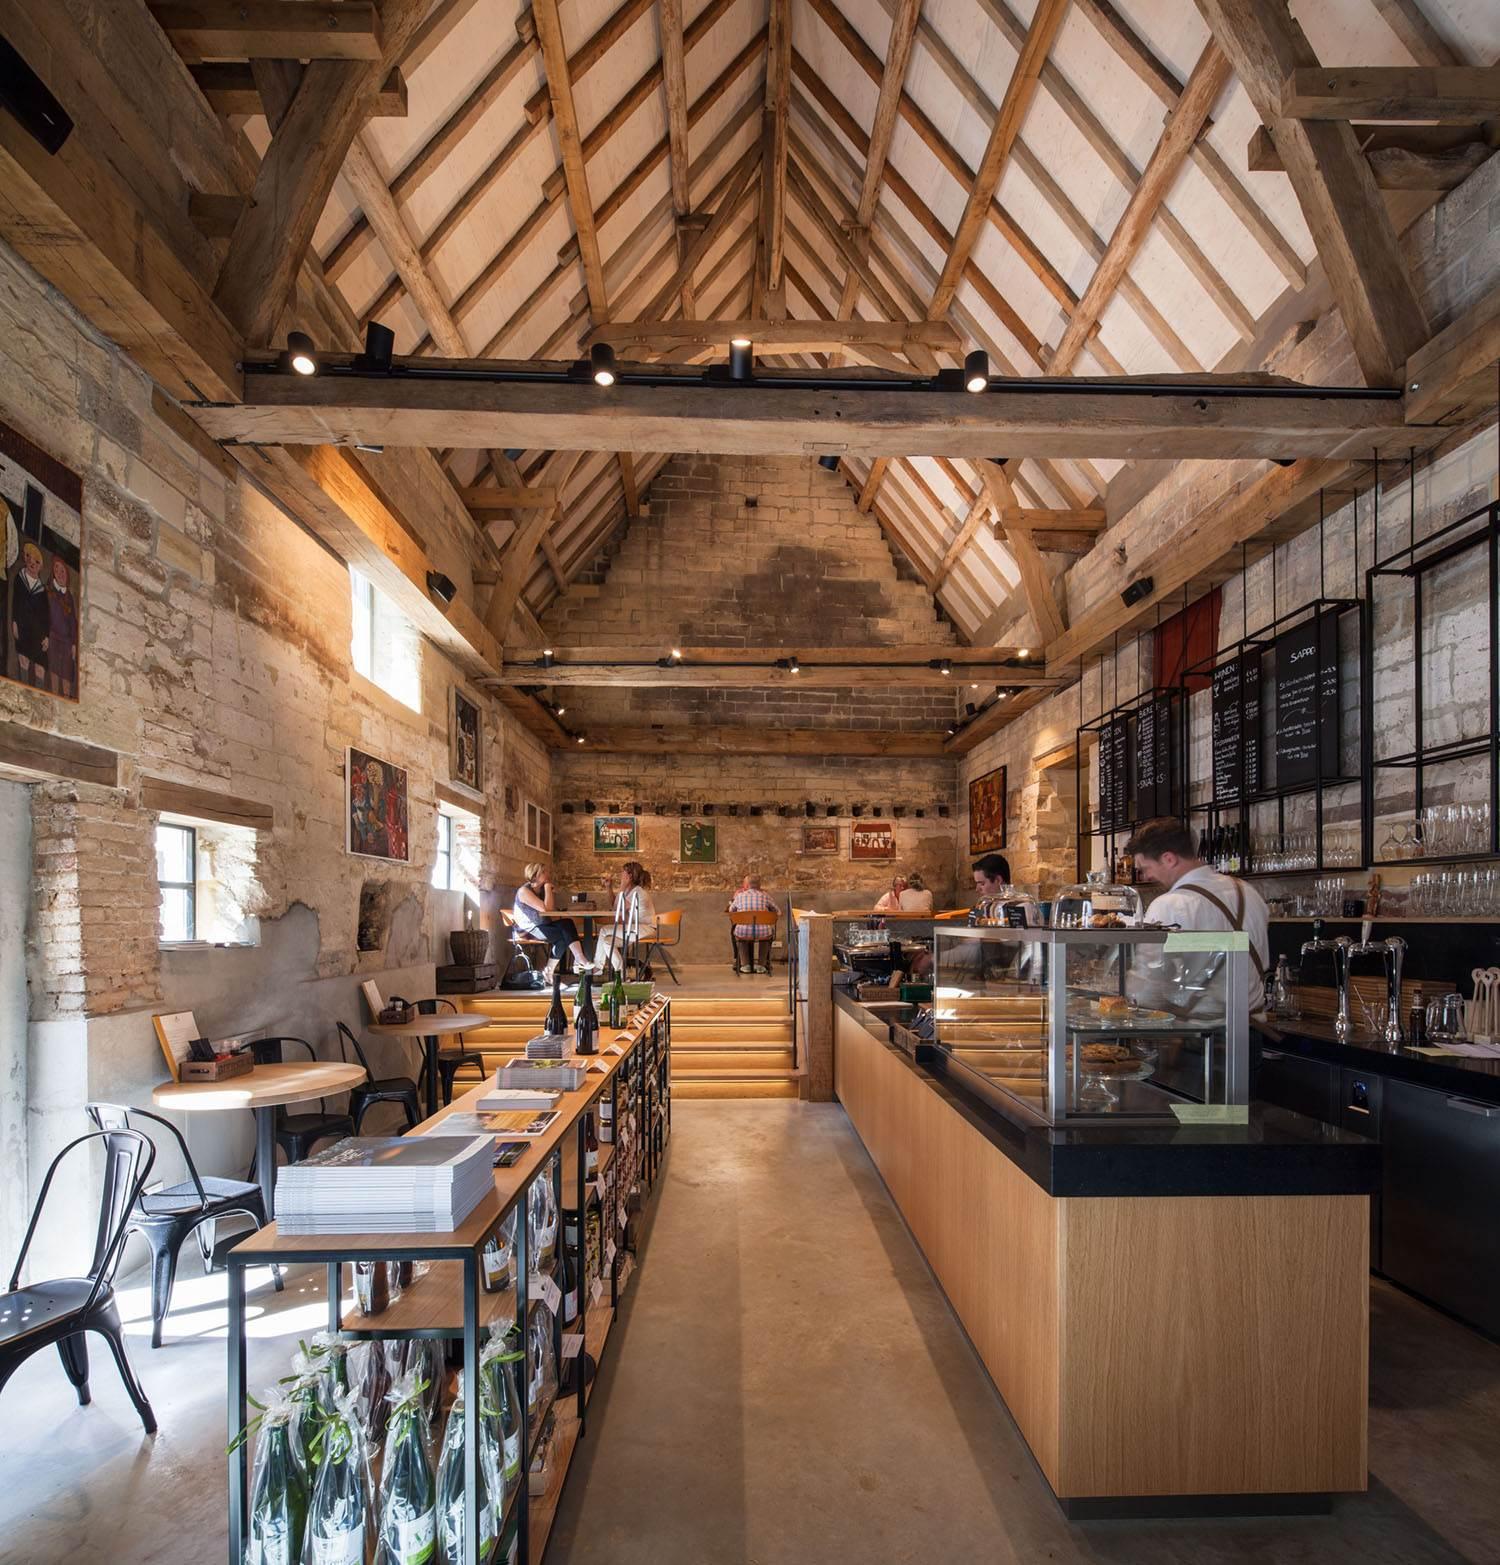 6_St. Gerlach Pavilion & Manor Farm_mecanoo_Inspirationist